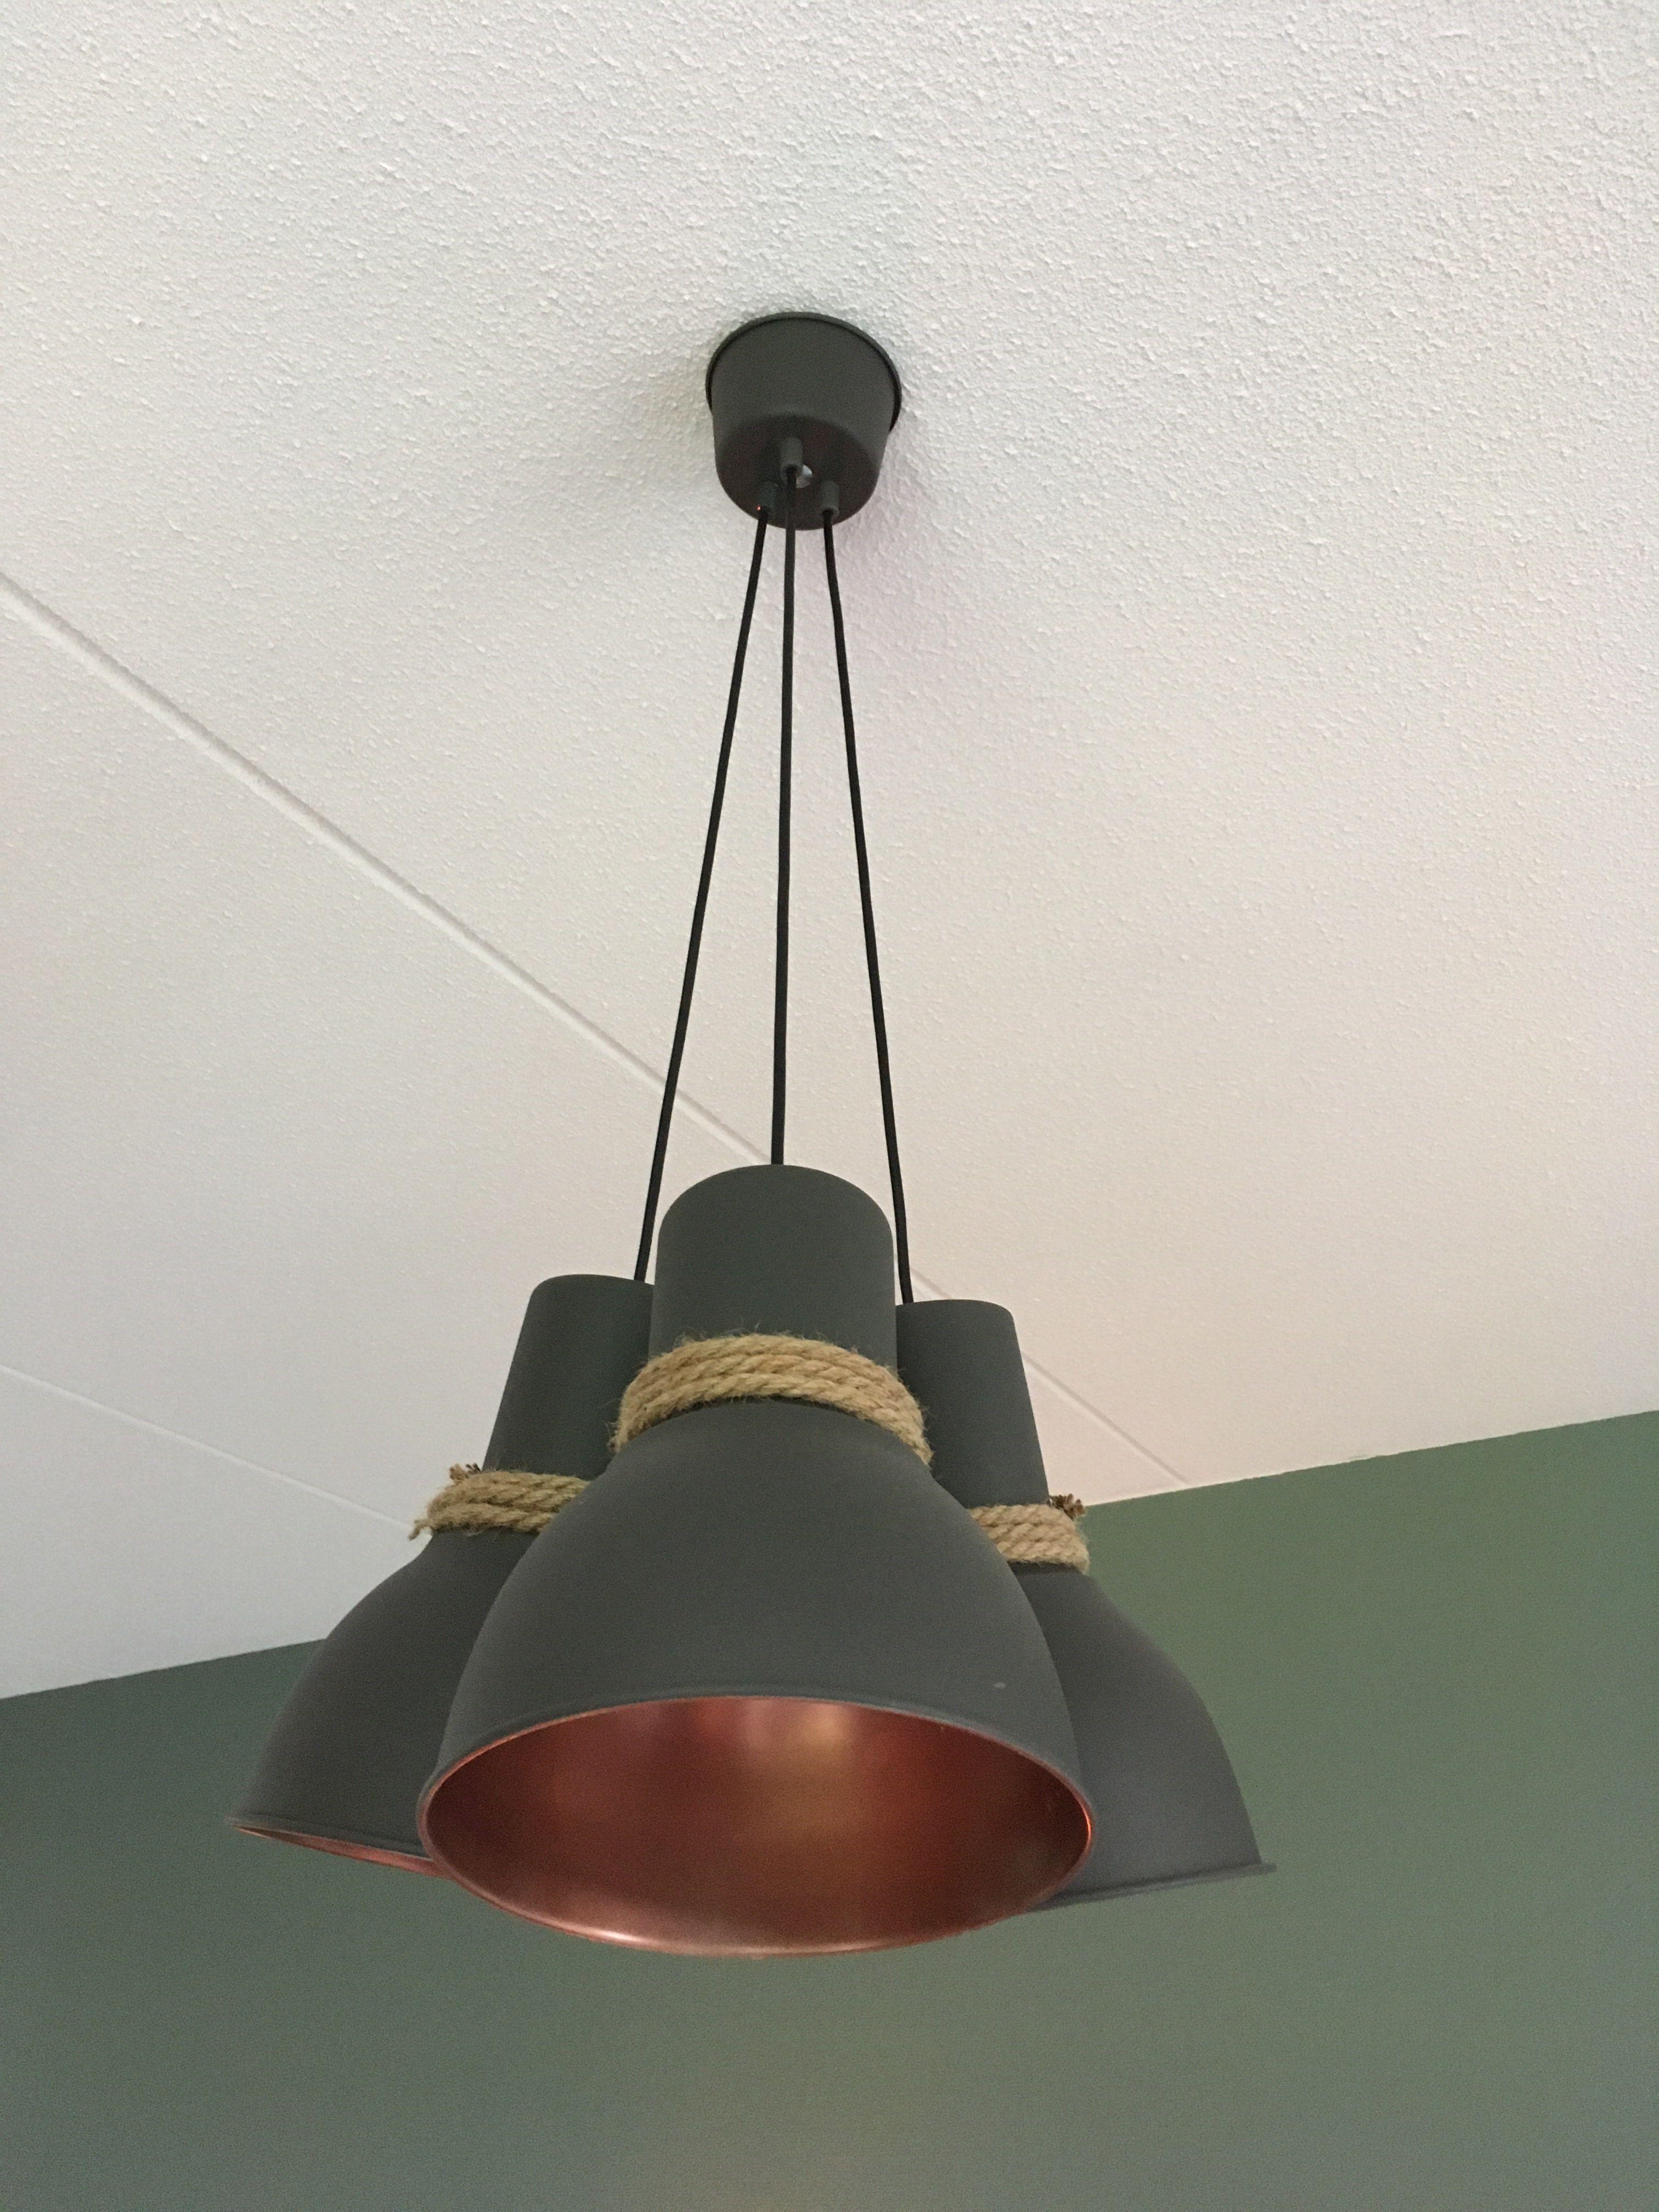 Ikea Hack Hektar Lamp Diy Hausbau Ideen Haus Bauen Ideen